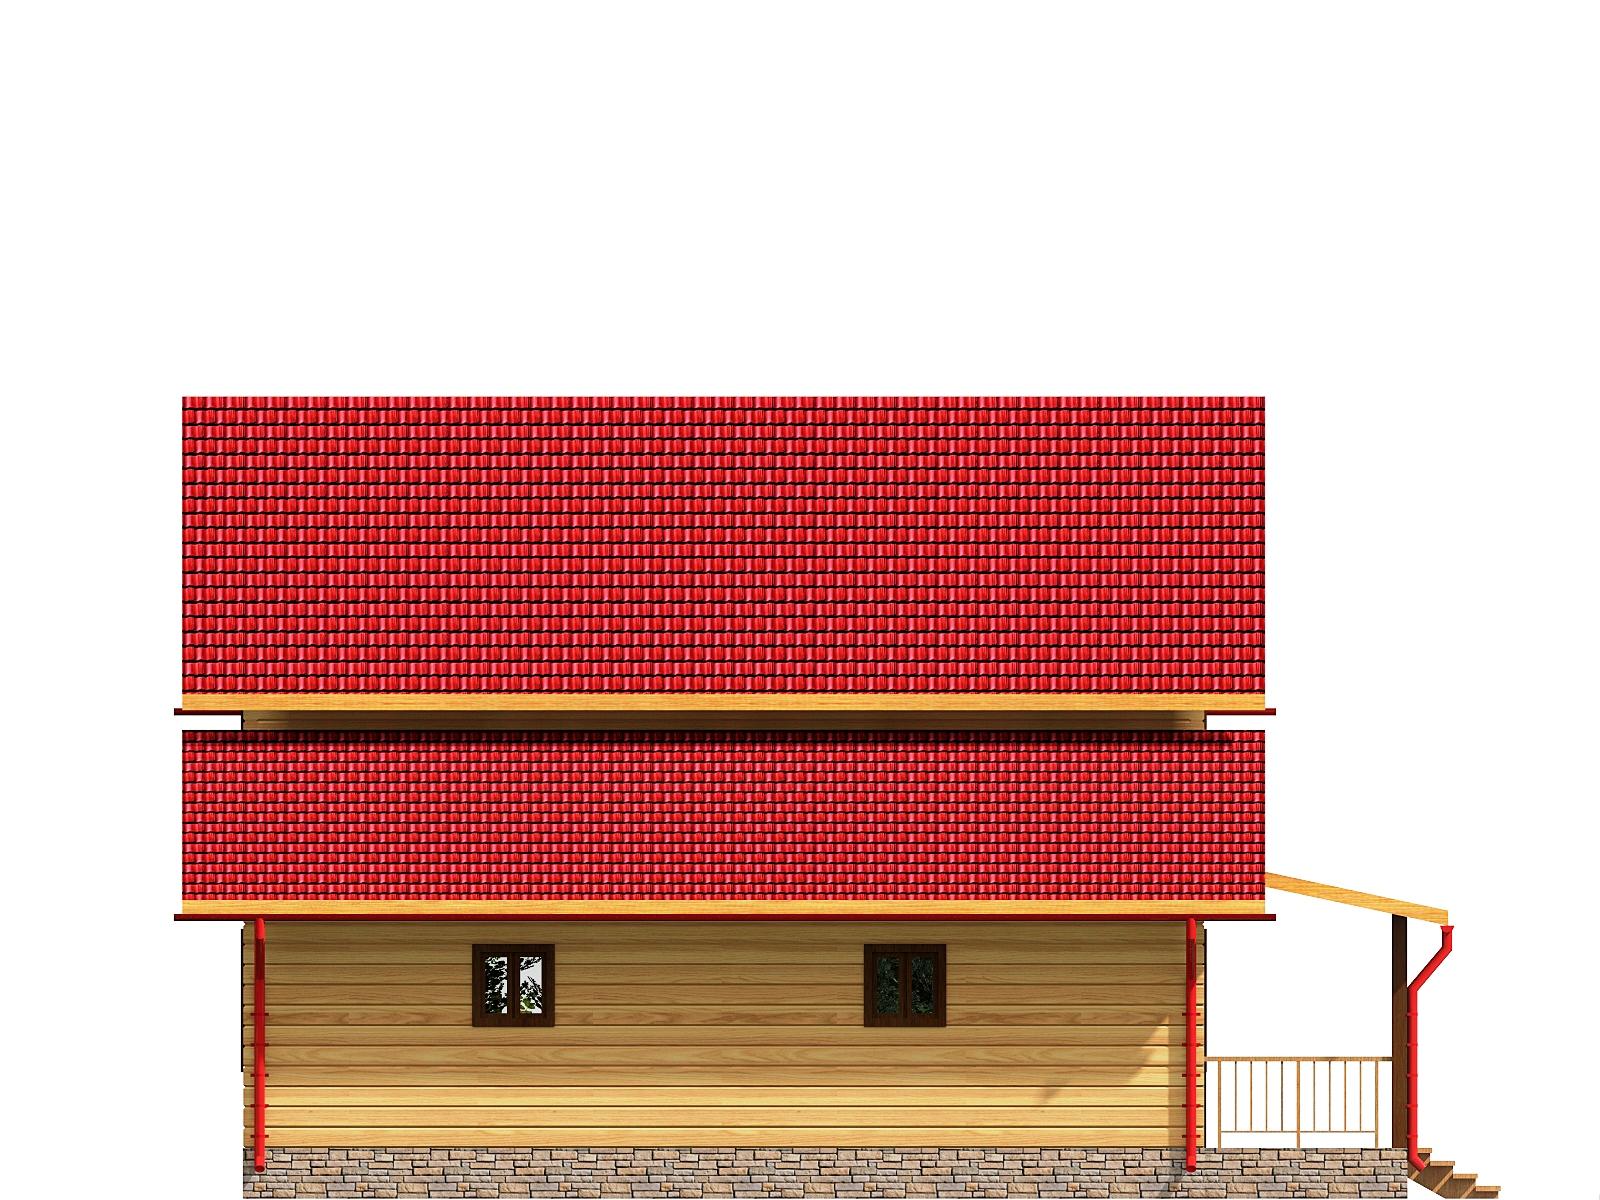 Проект дома из бруса 9,3х12,8 1,5 этажа с гаражом. Разрез 4.